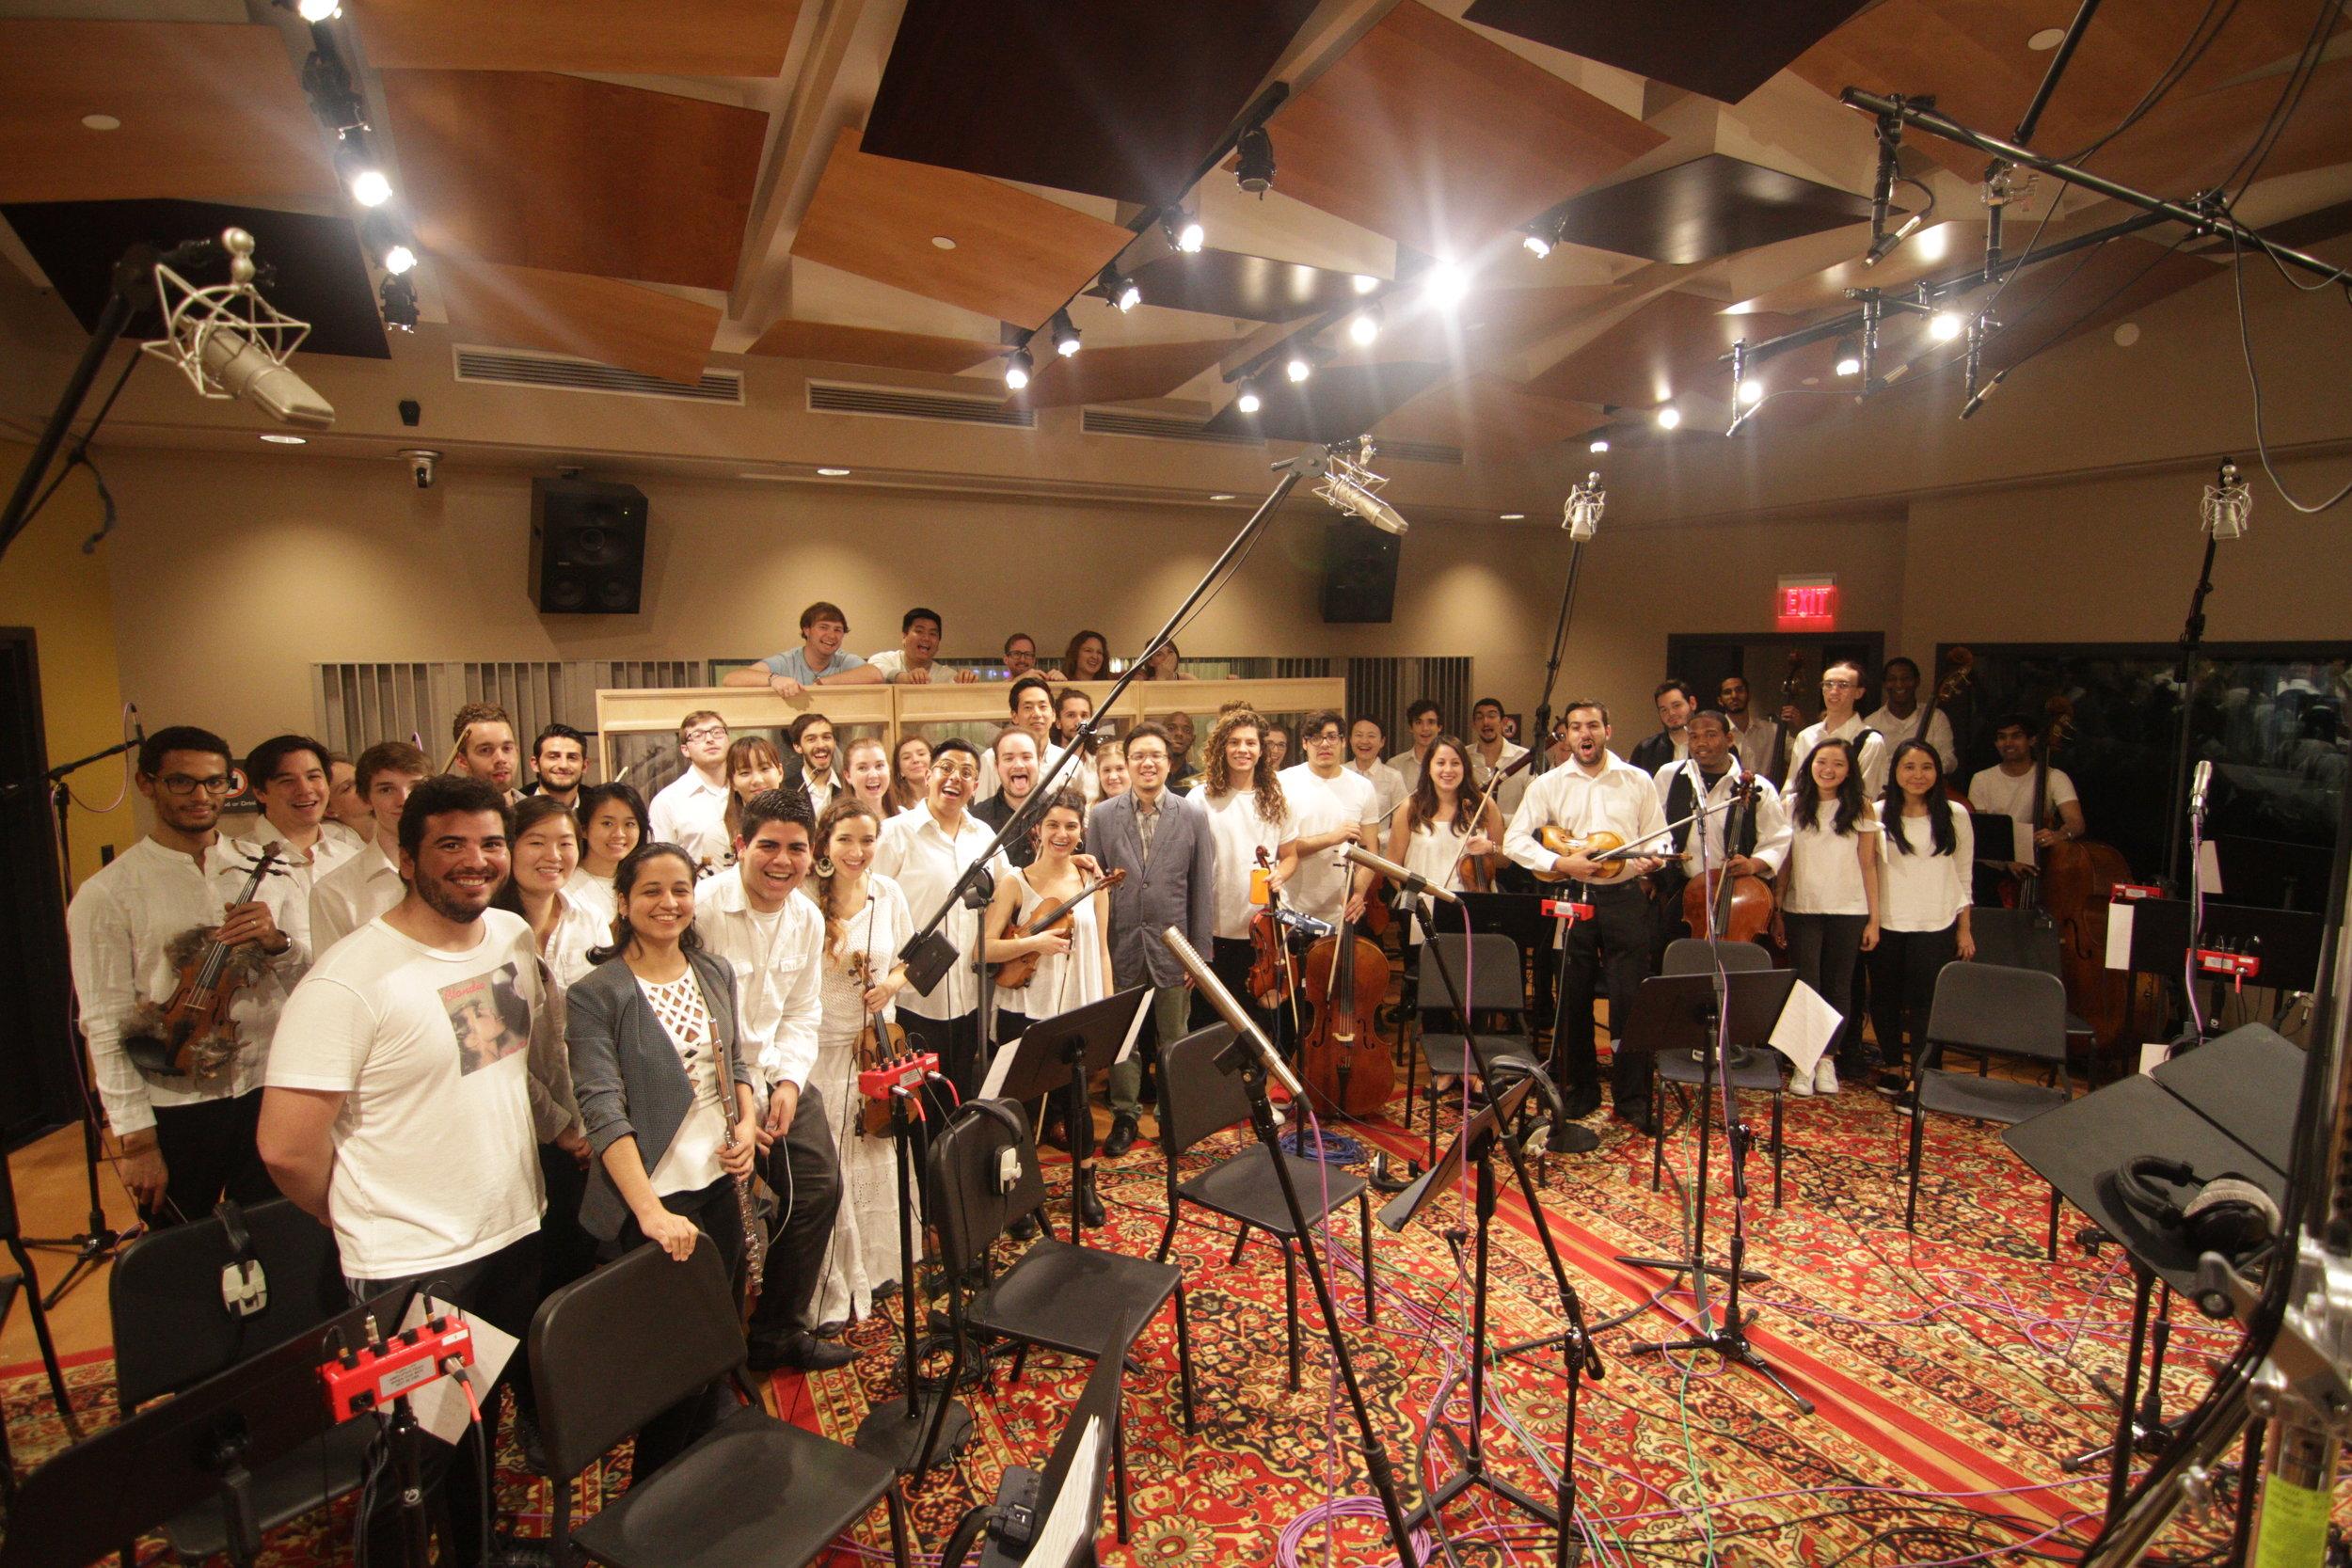 Another recording project at Berklee Studio 1